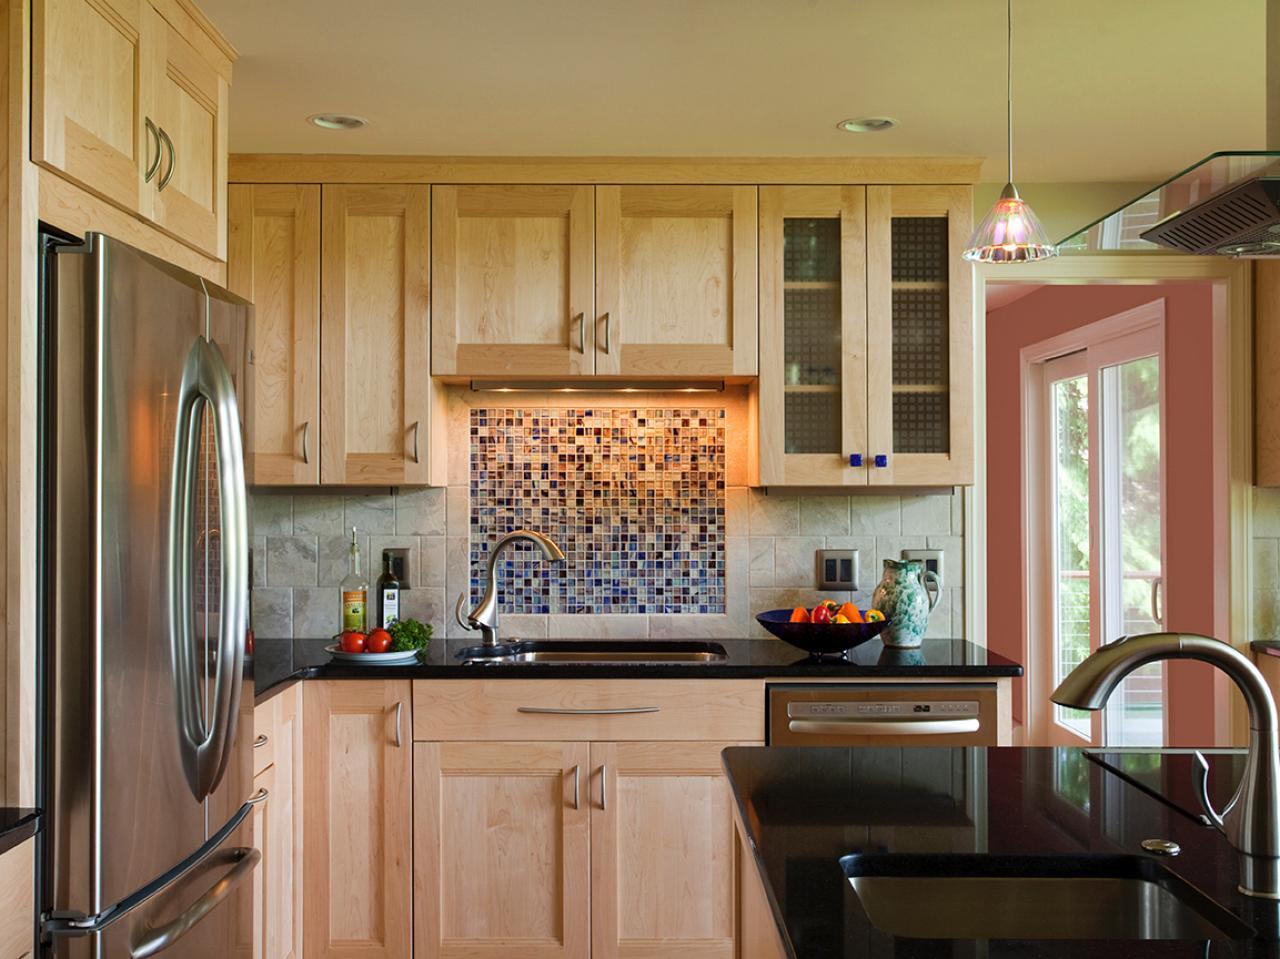 Декоративная вставка из мозаики на кухне